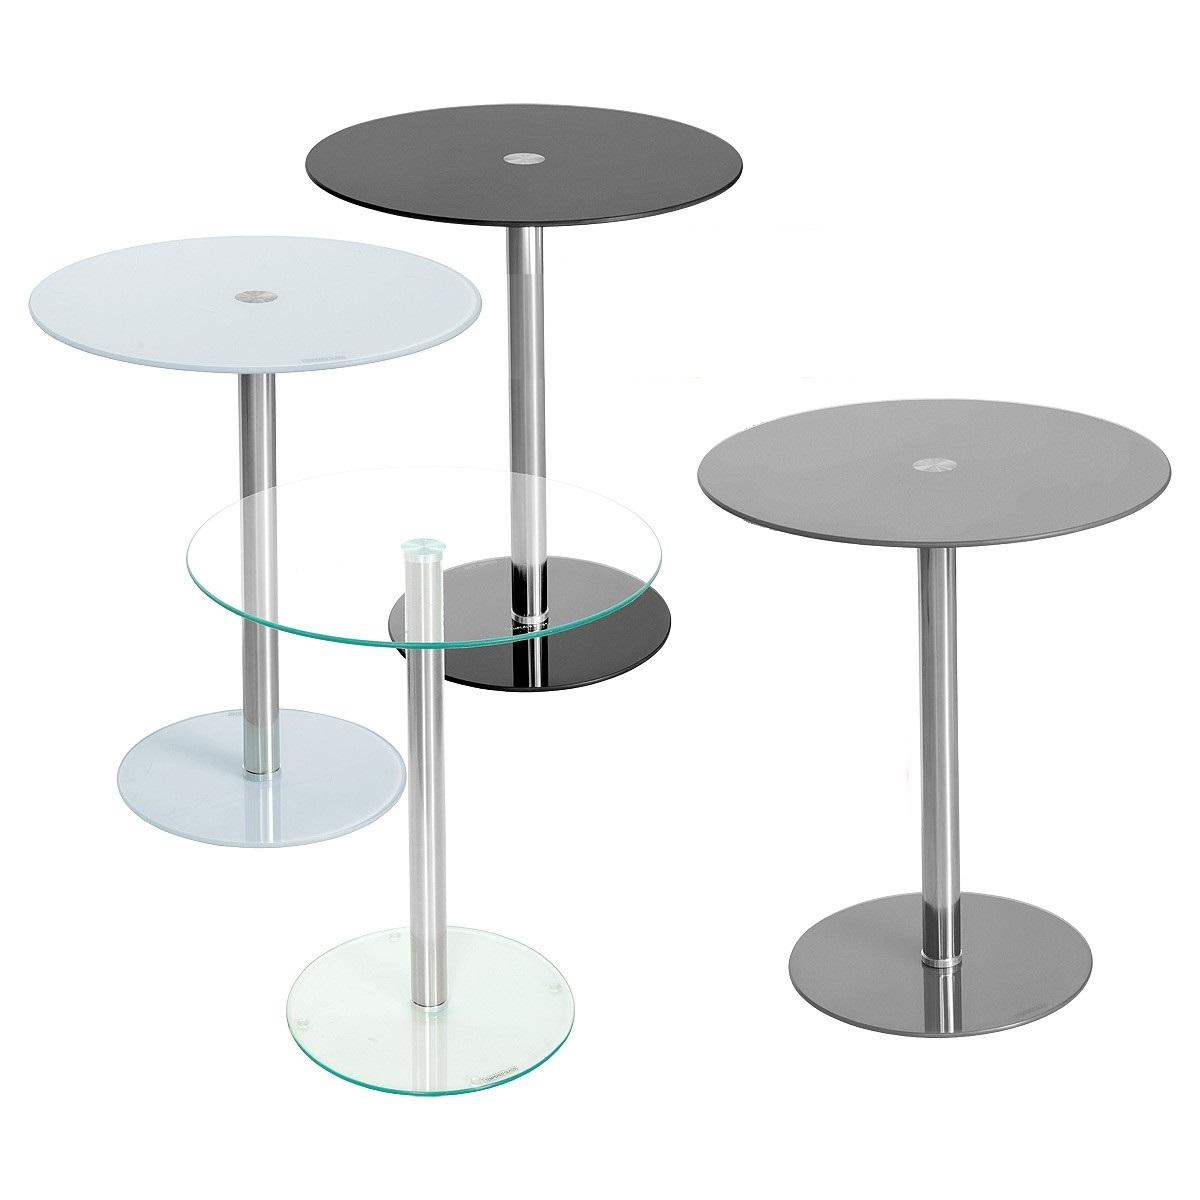 Retro Coffee Tables - Wotever